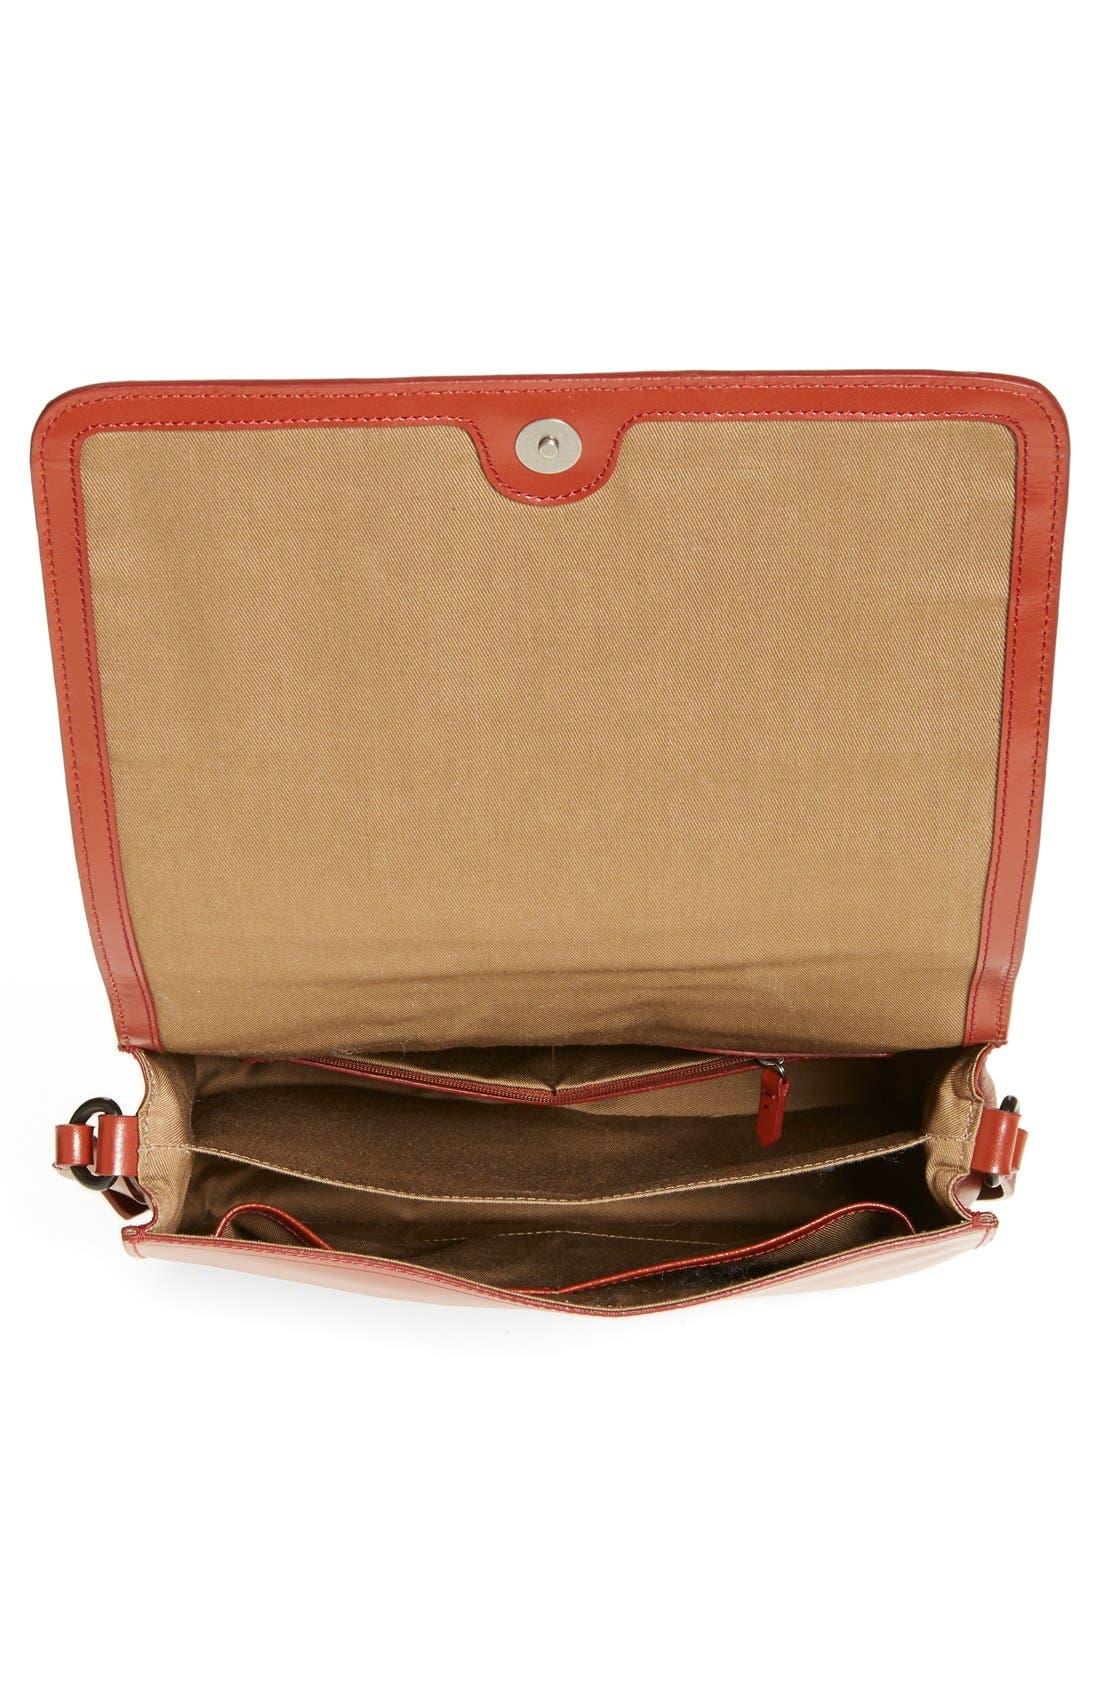 Alternate Image 3  - Kelsi Dagger Brooklyn 'Courier' Leather Crossbody Bag